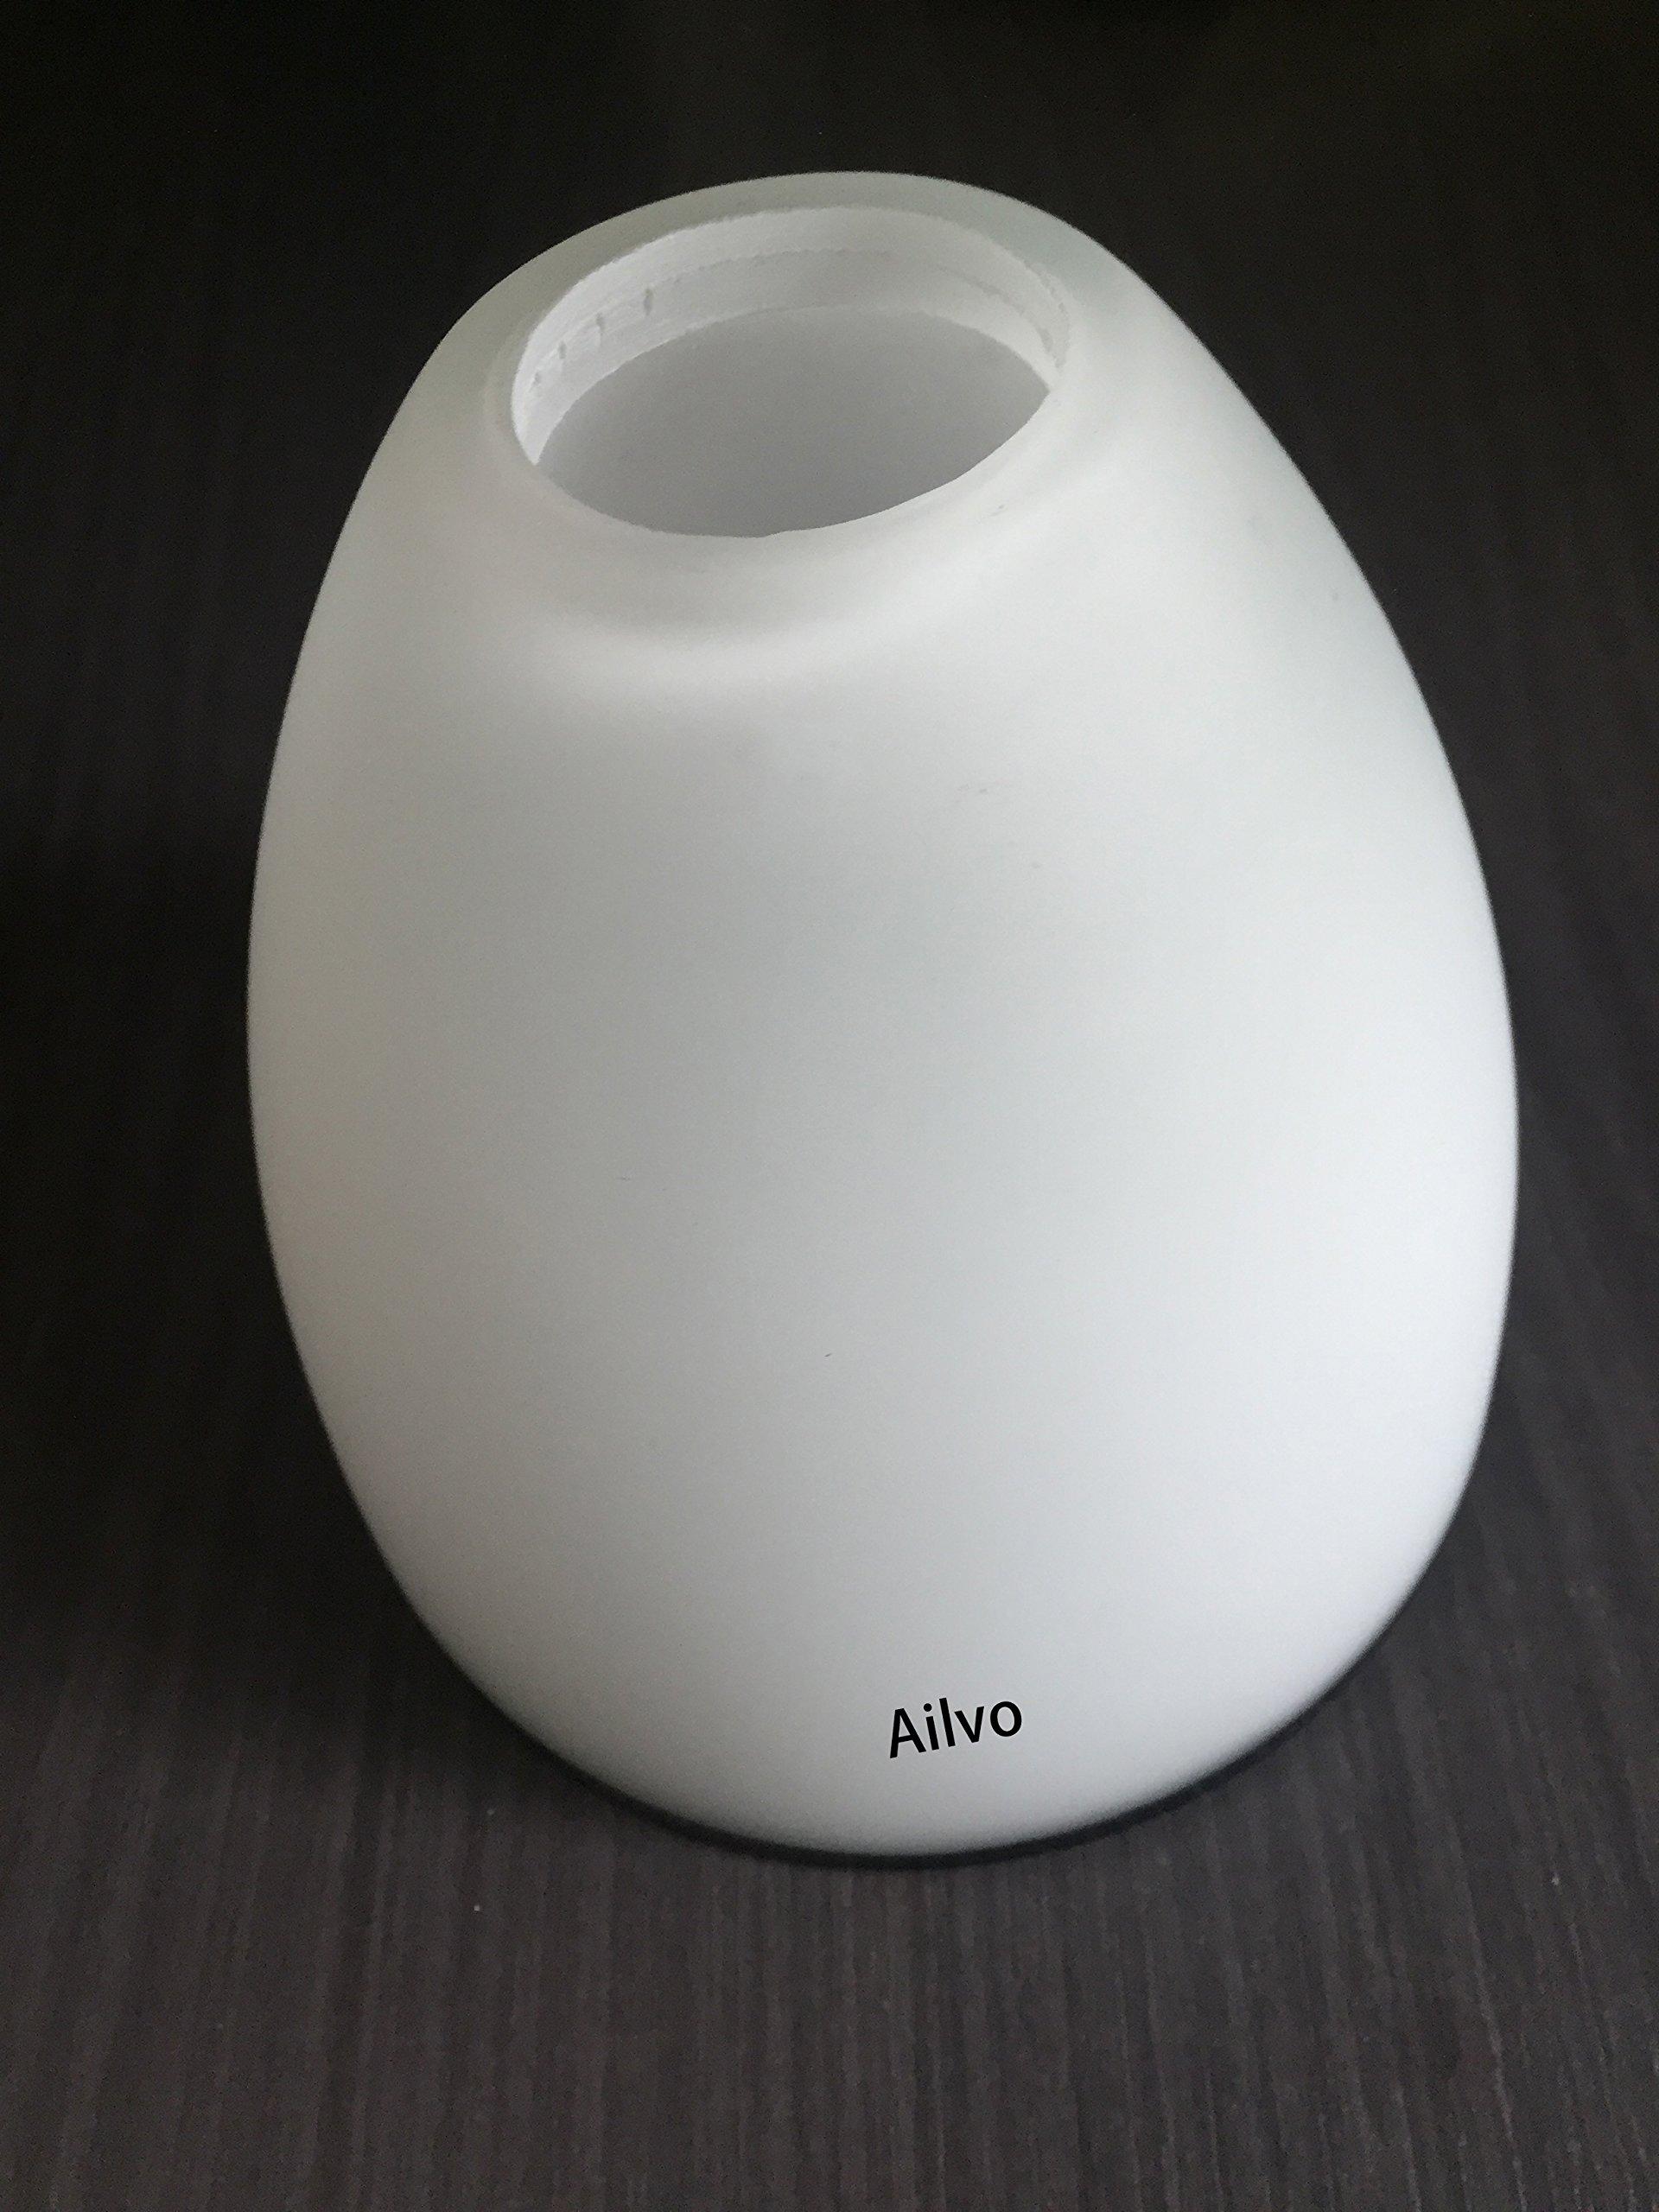 Alivo Lamp Shade Lamp Shade Small for Living Room, Bedroom